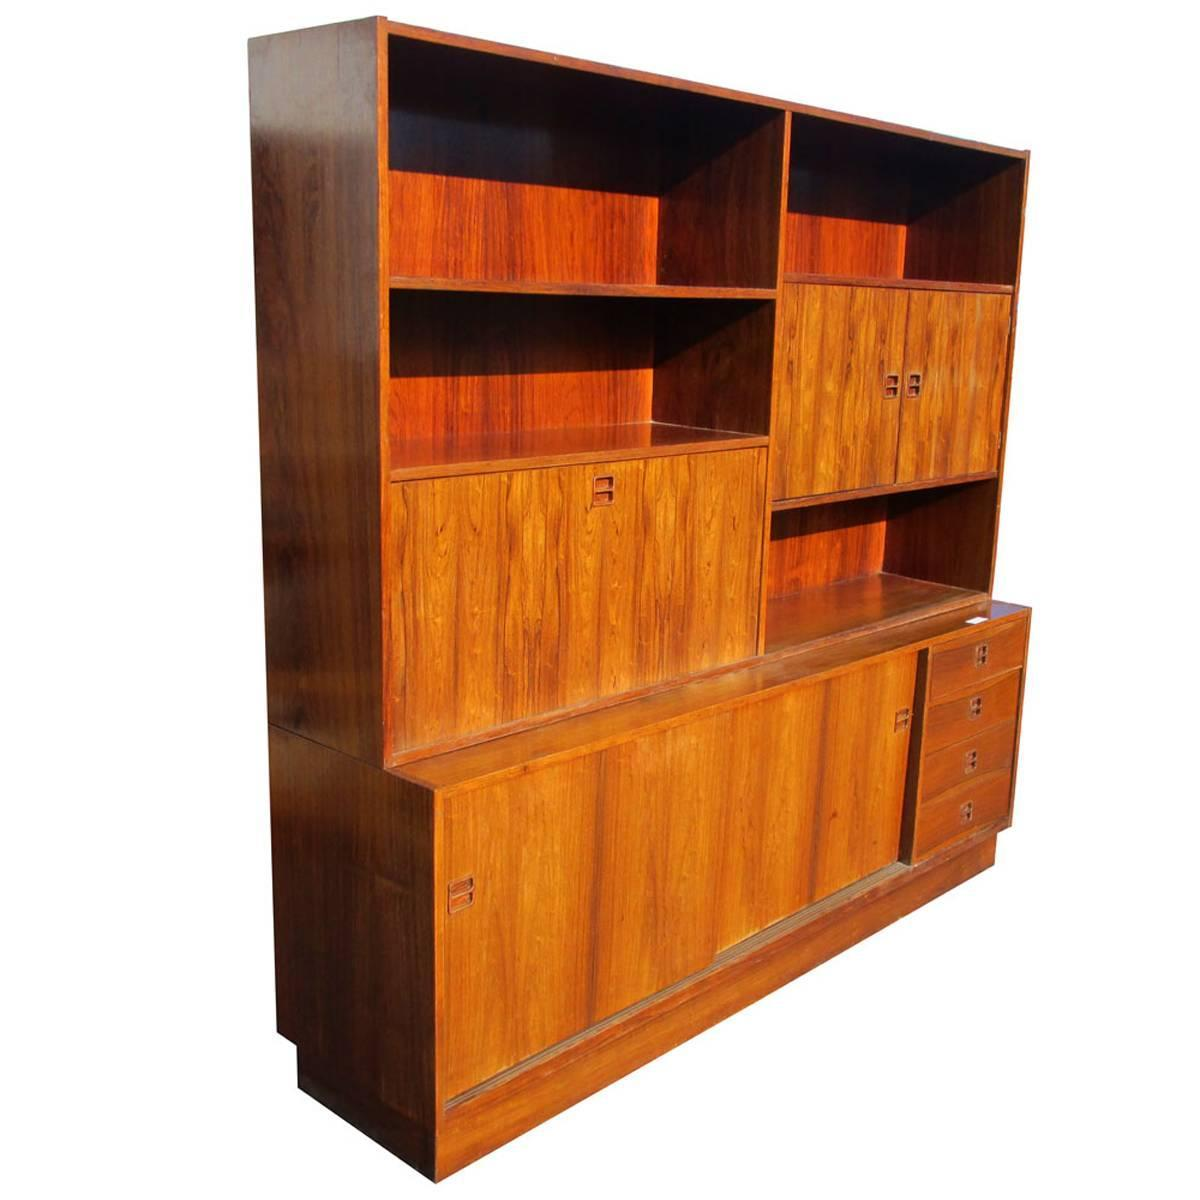 Vintage Rosewood Poul Hundevad Wall Unit Bookcase Drop